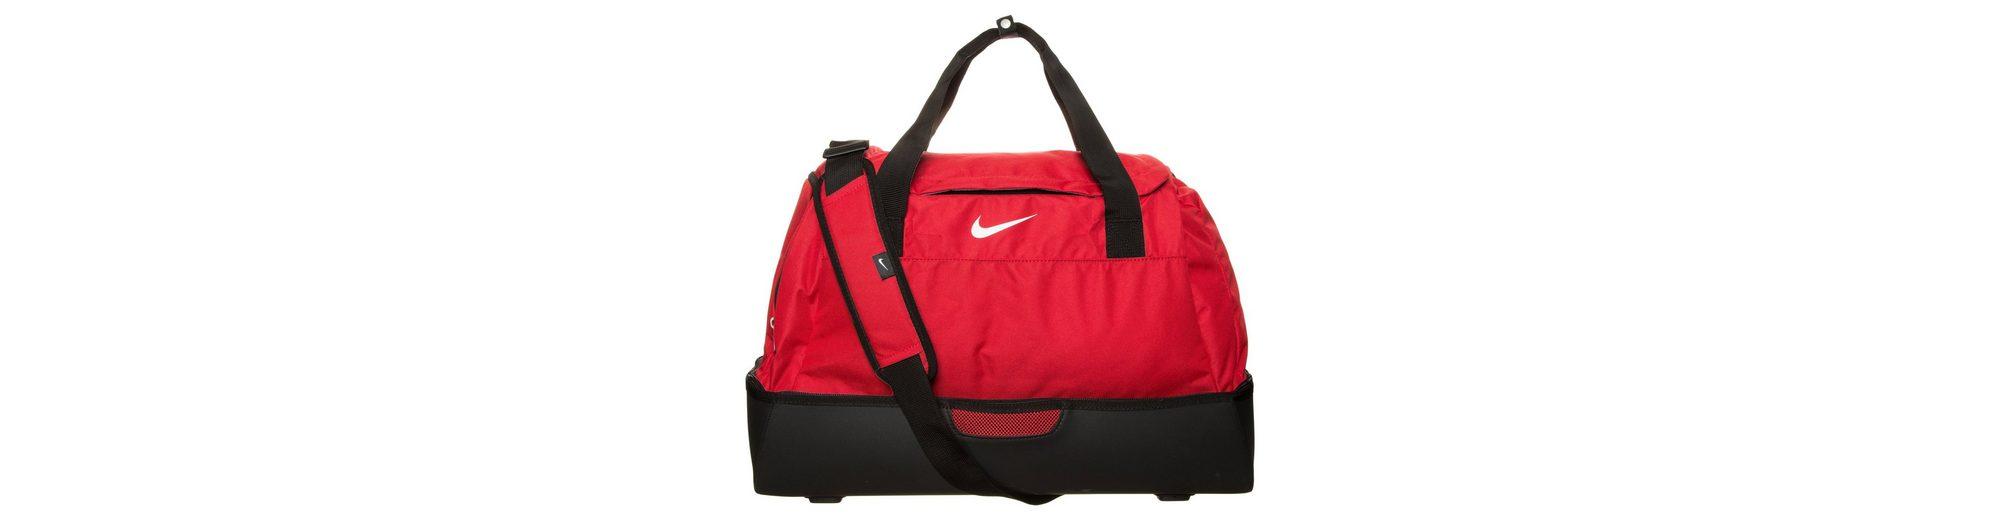 NIKE Club Team Swoosh Hardcase Sporttasche Large